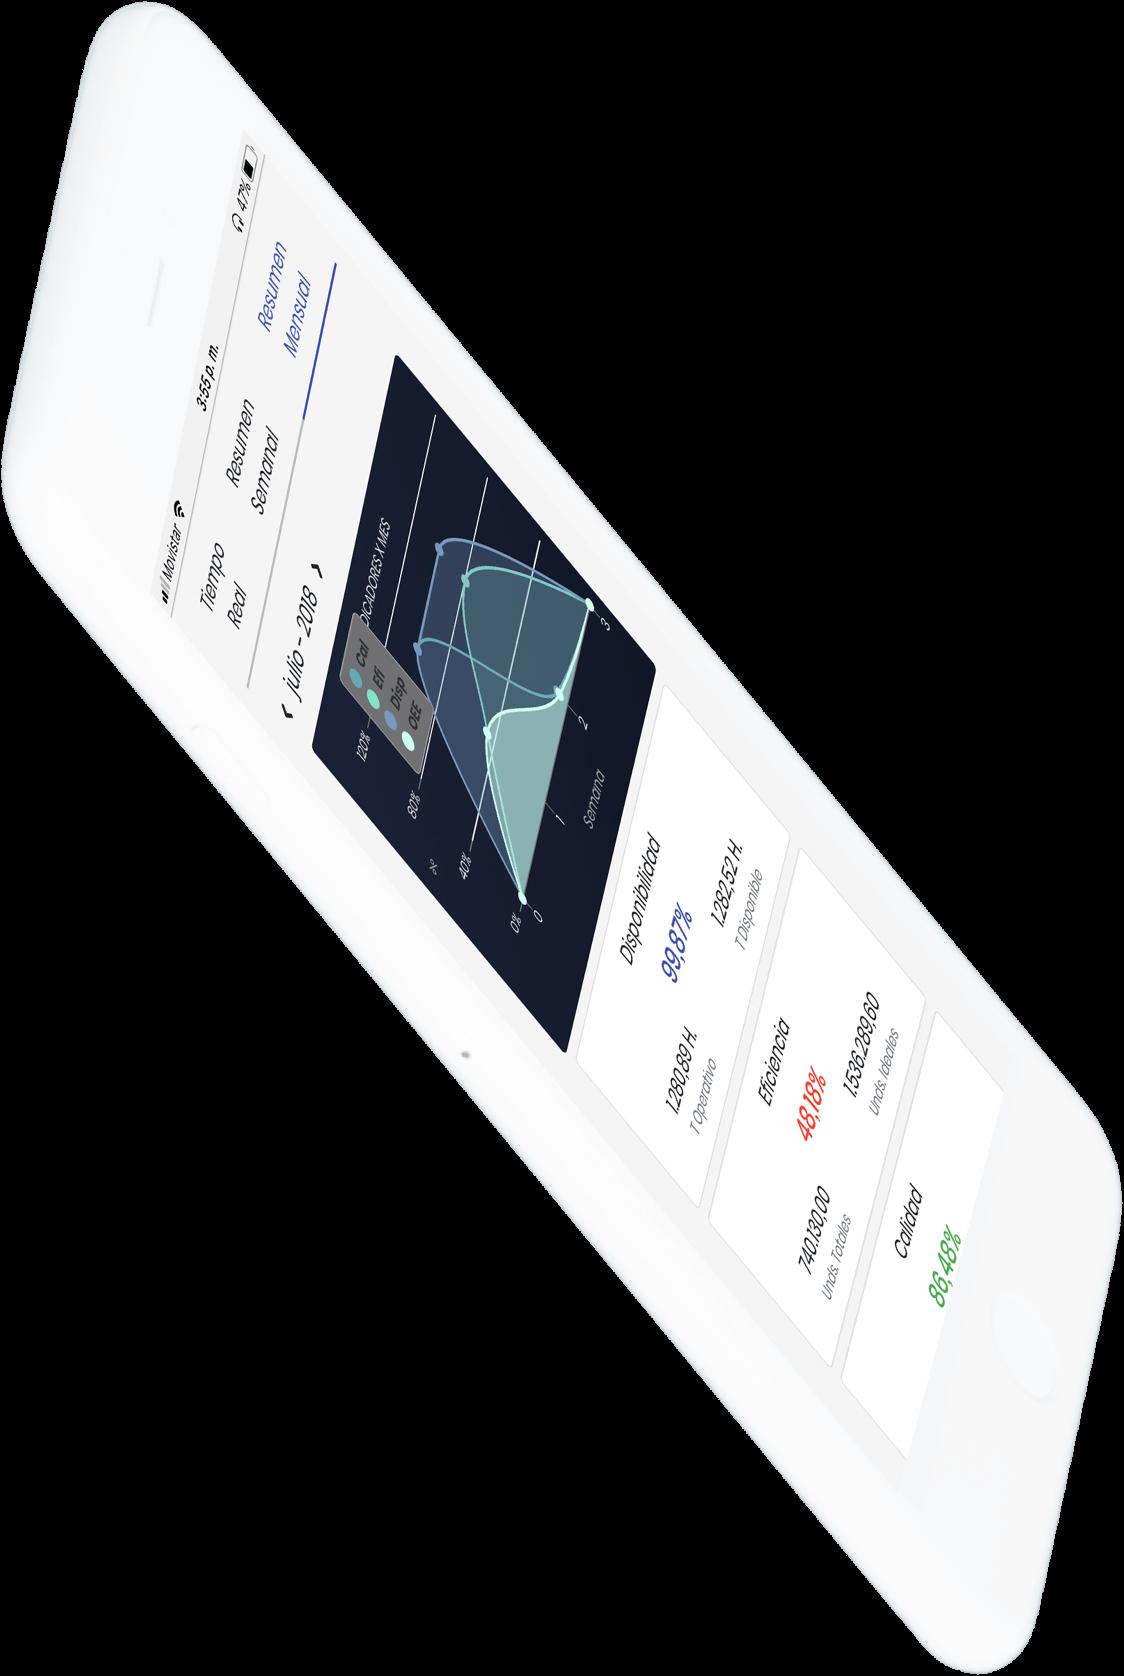 elemental web phone